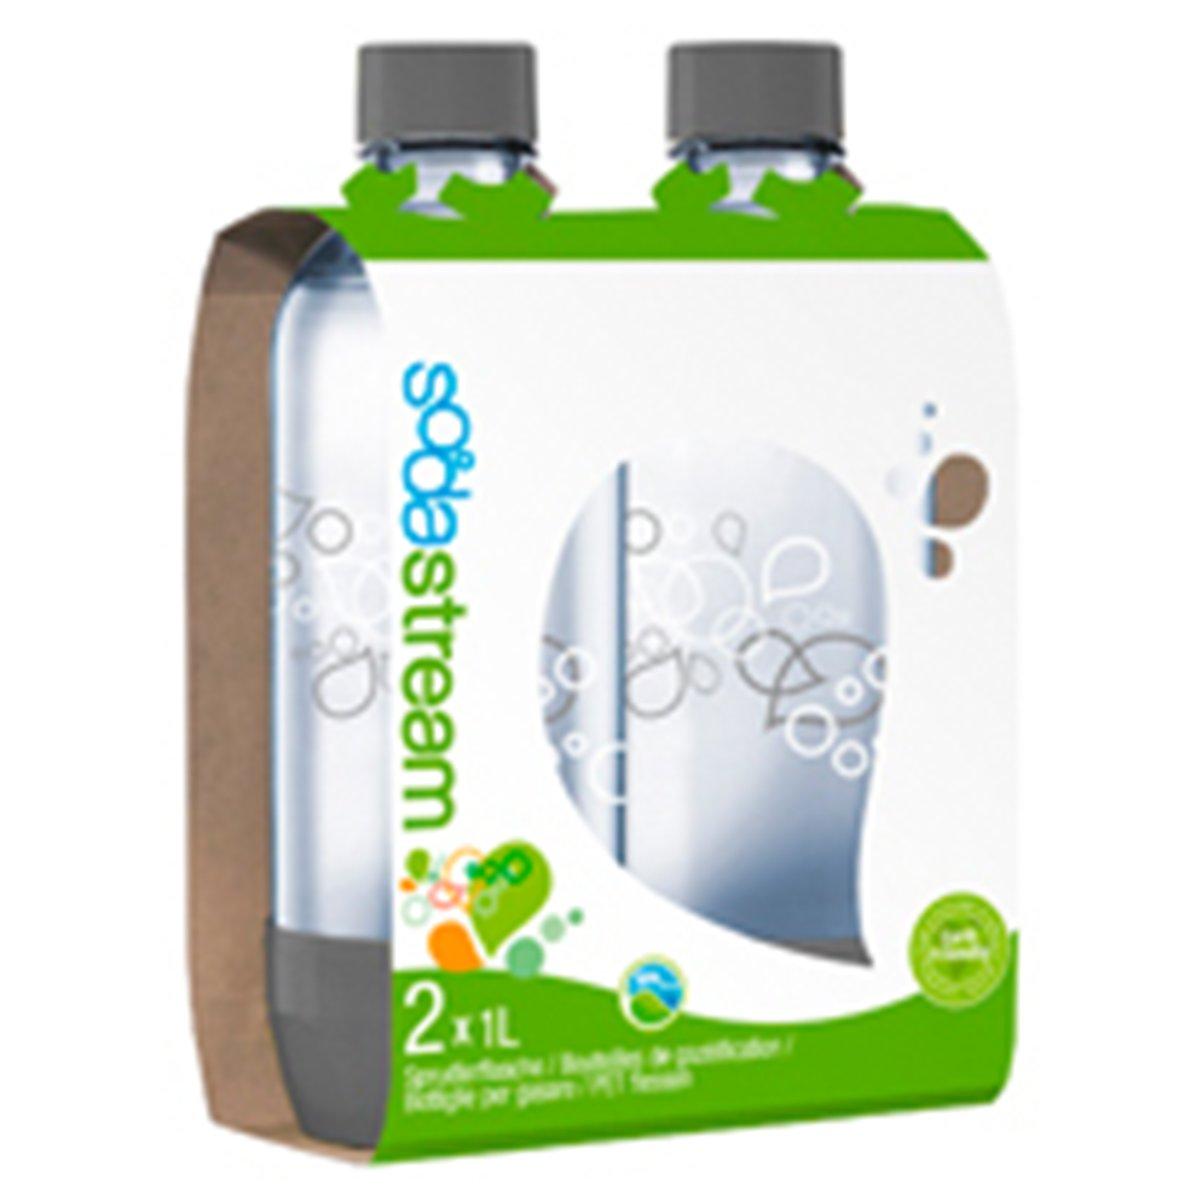 Sodastream Waterfilterkan Herbruikbare flessen - 2 flessen pack